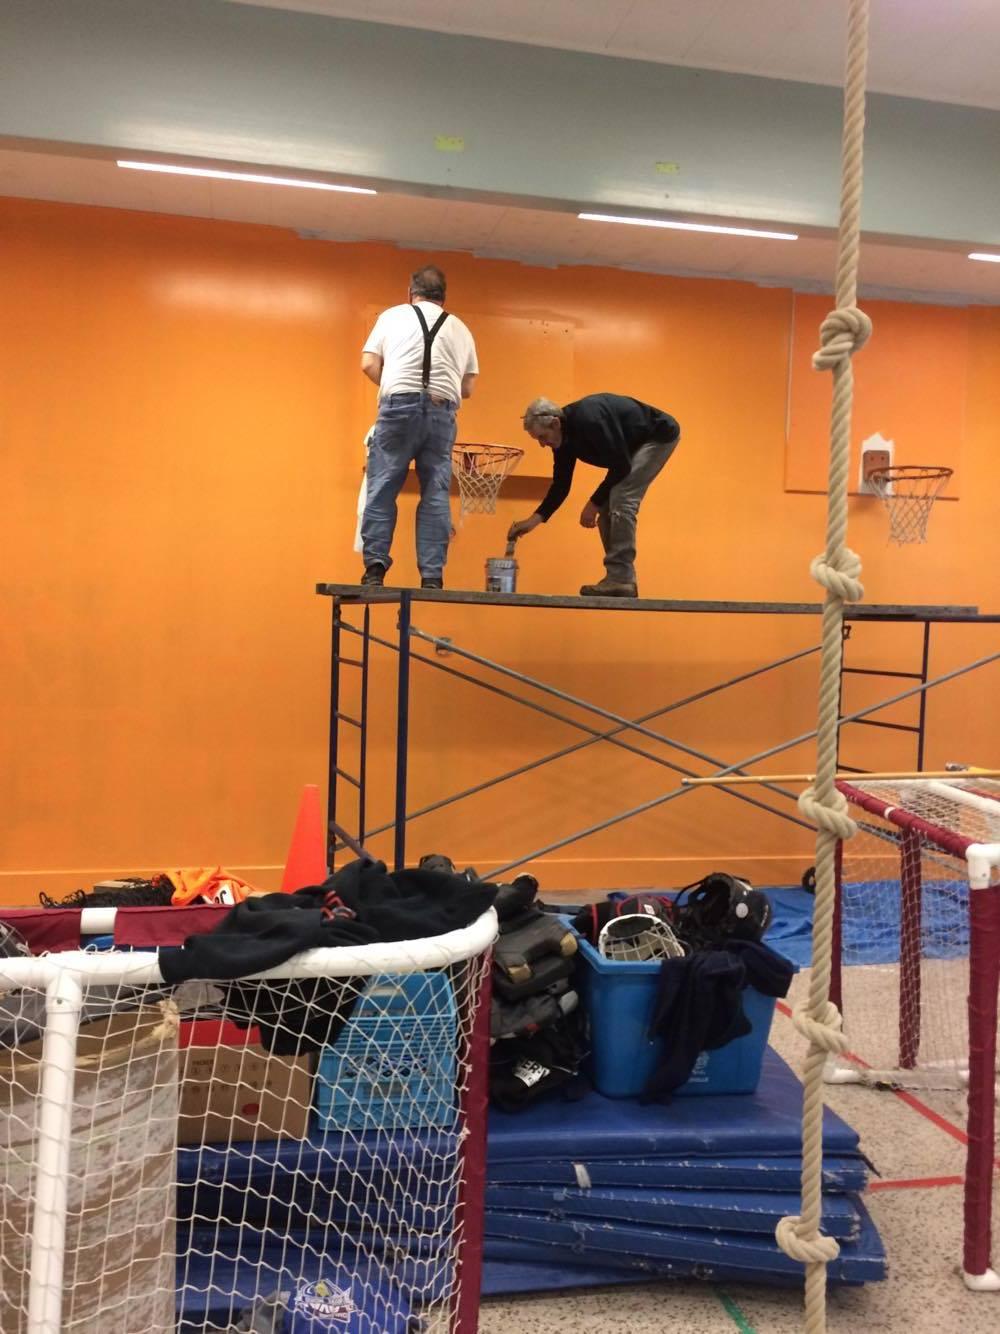 CCQ halts volunteer painting project at Saint-Sebastien school - image